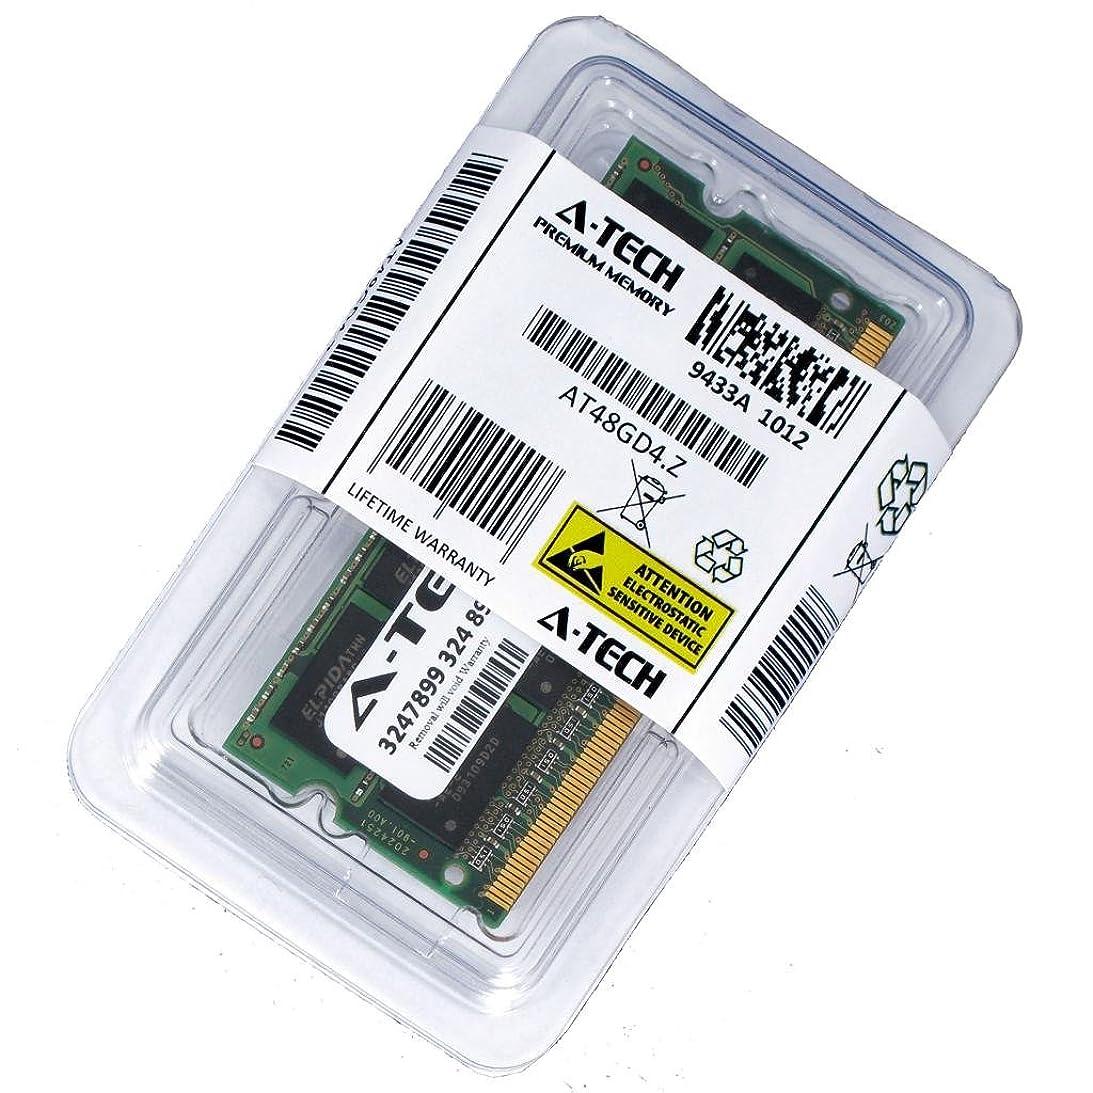 PARTS-QUICK Brand 4GB Memory Upgrade for Biostar T5 XE Motherboard DDR3 PC3-10600 Non-ECC DIMM RAM